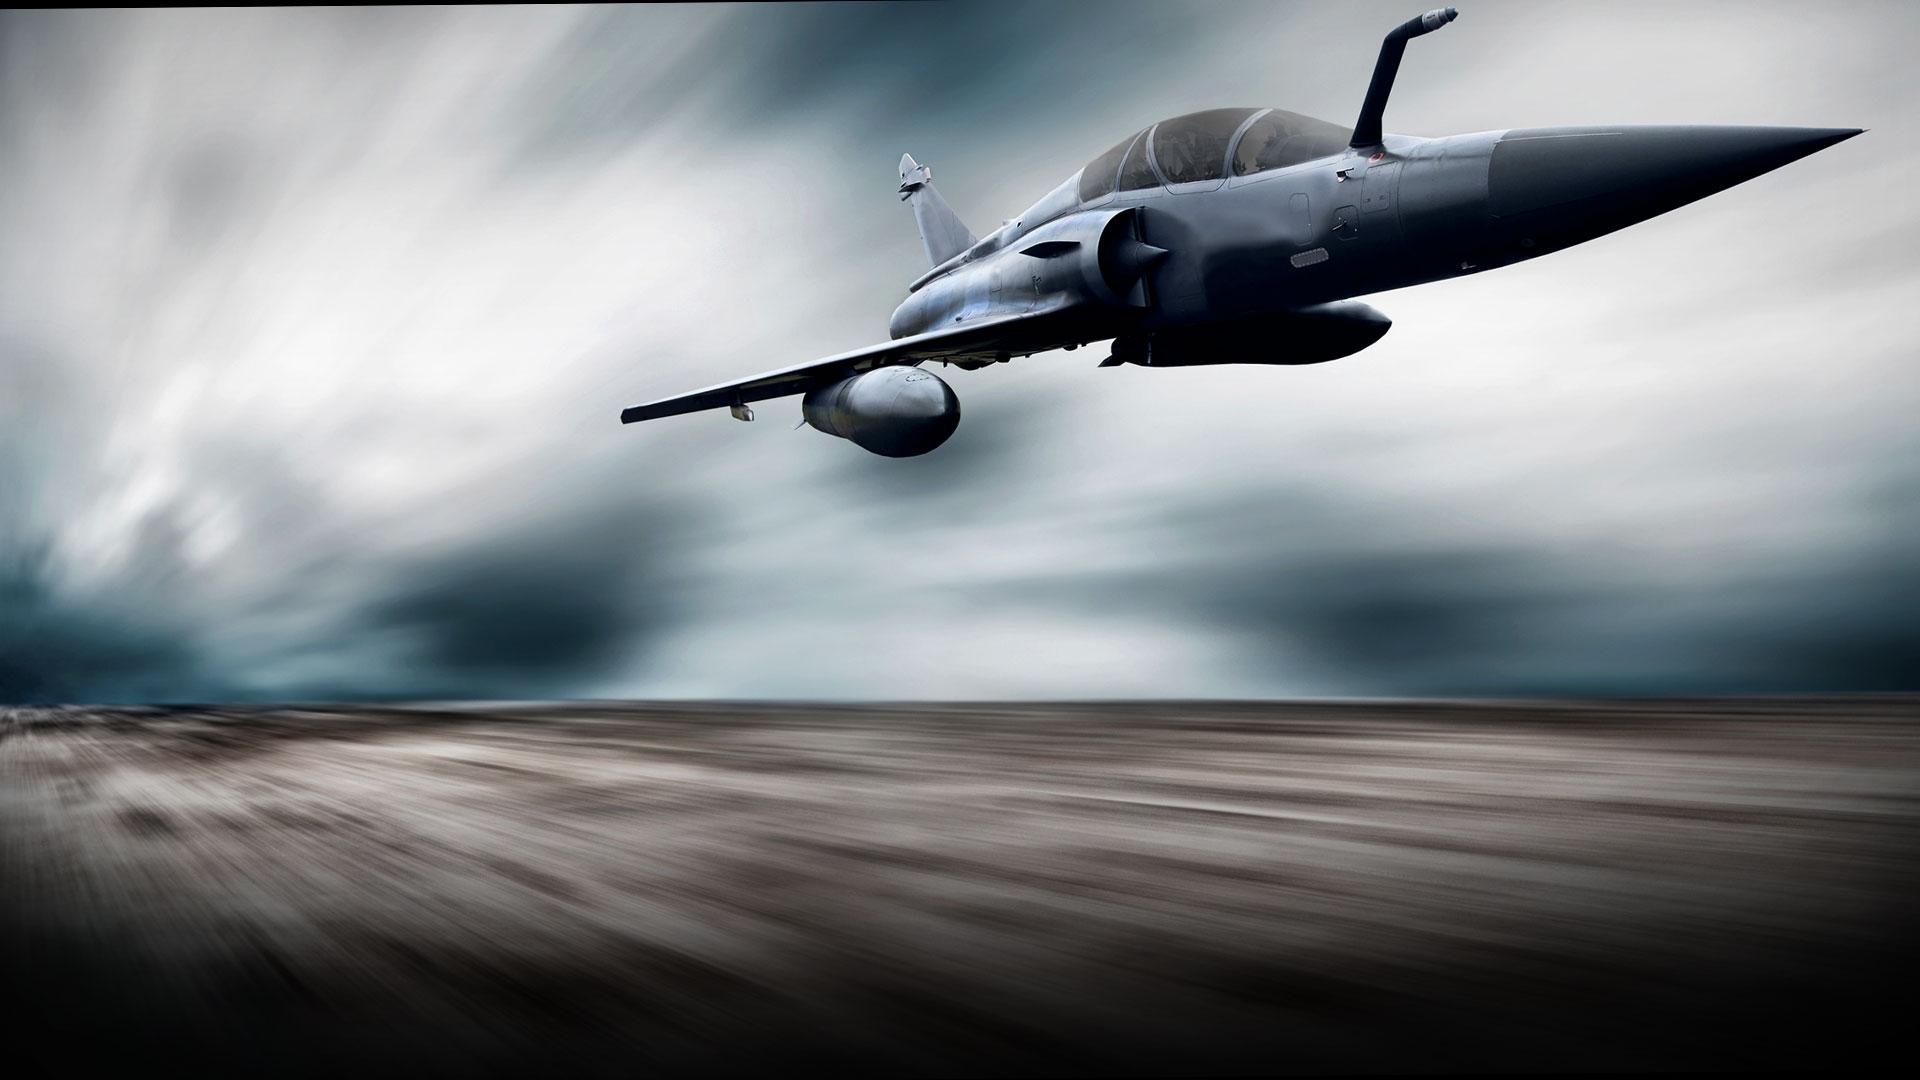 Supra Nero-TX Pro - jet fighter